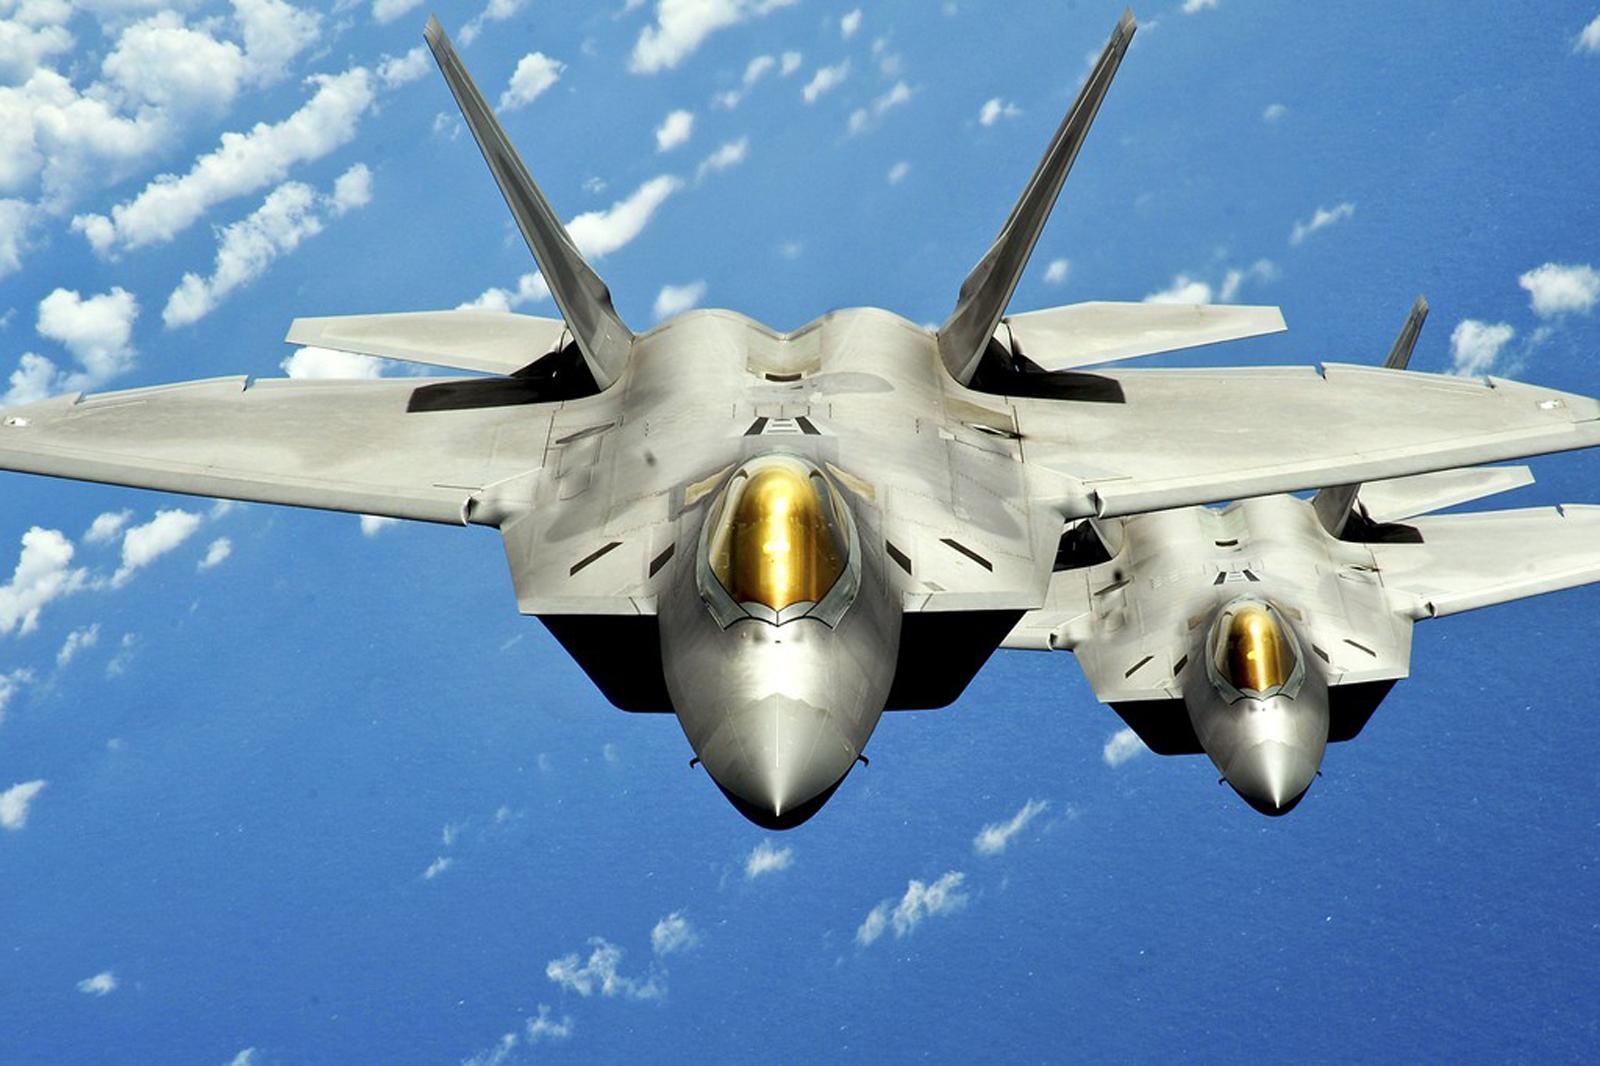 F 22 Raptor Wallpaper: F-22 Raptor Jet Fighter HD Wallpapers